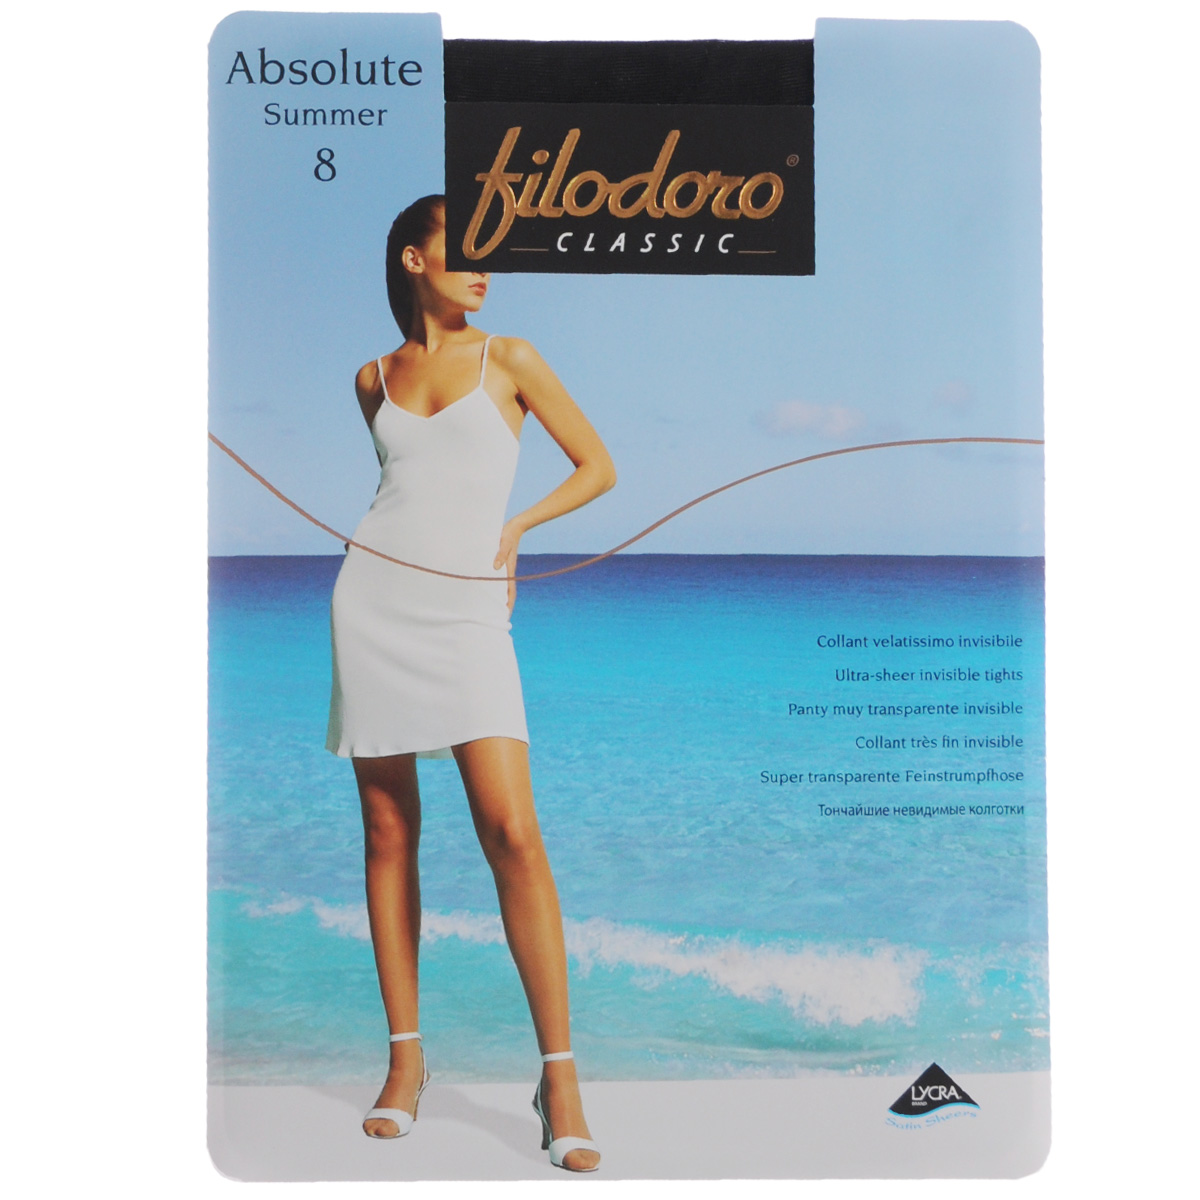 Колготки женские Filodoro Classic Absolute Summer 8, цвет: Nero (черный). C109155FC. Размер 4 (L) колготки filodoro cotton wool размер 4 плотность 100 den nero